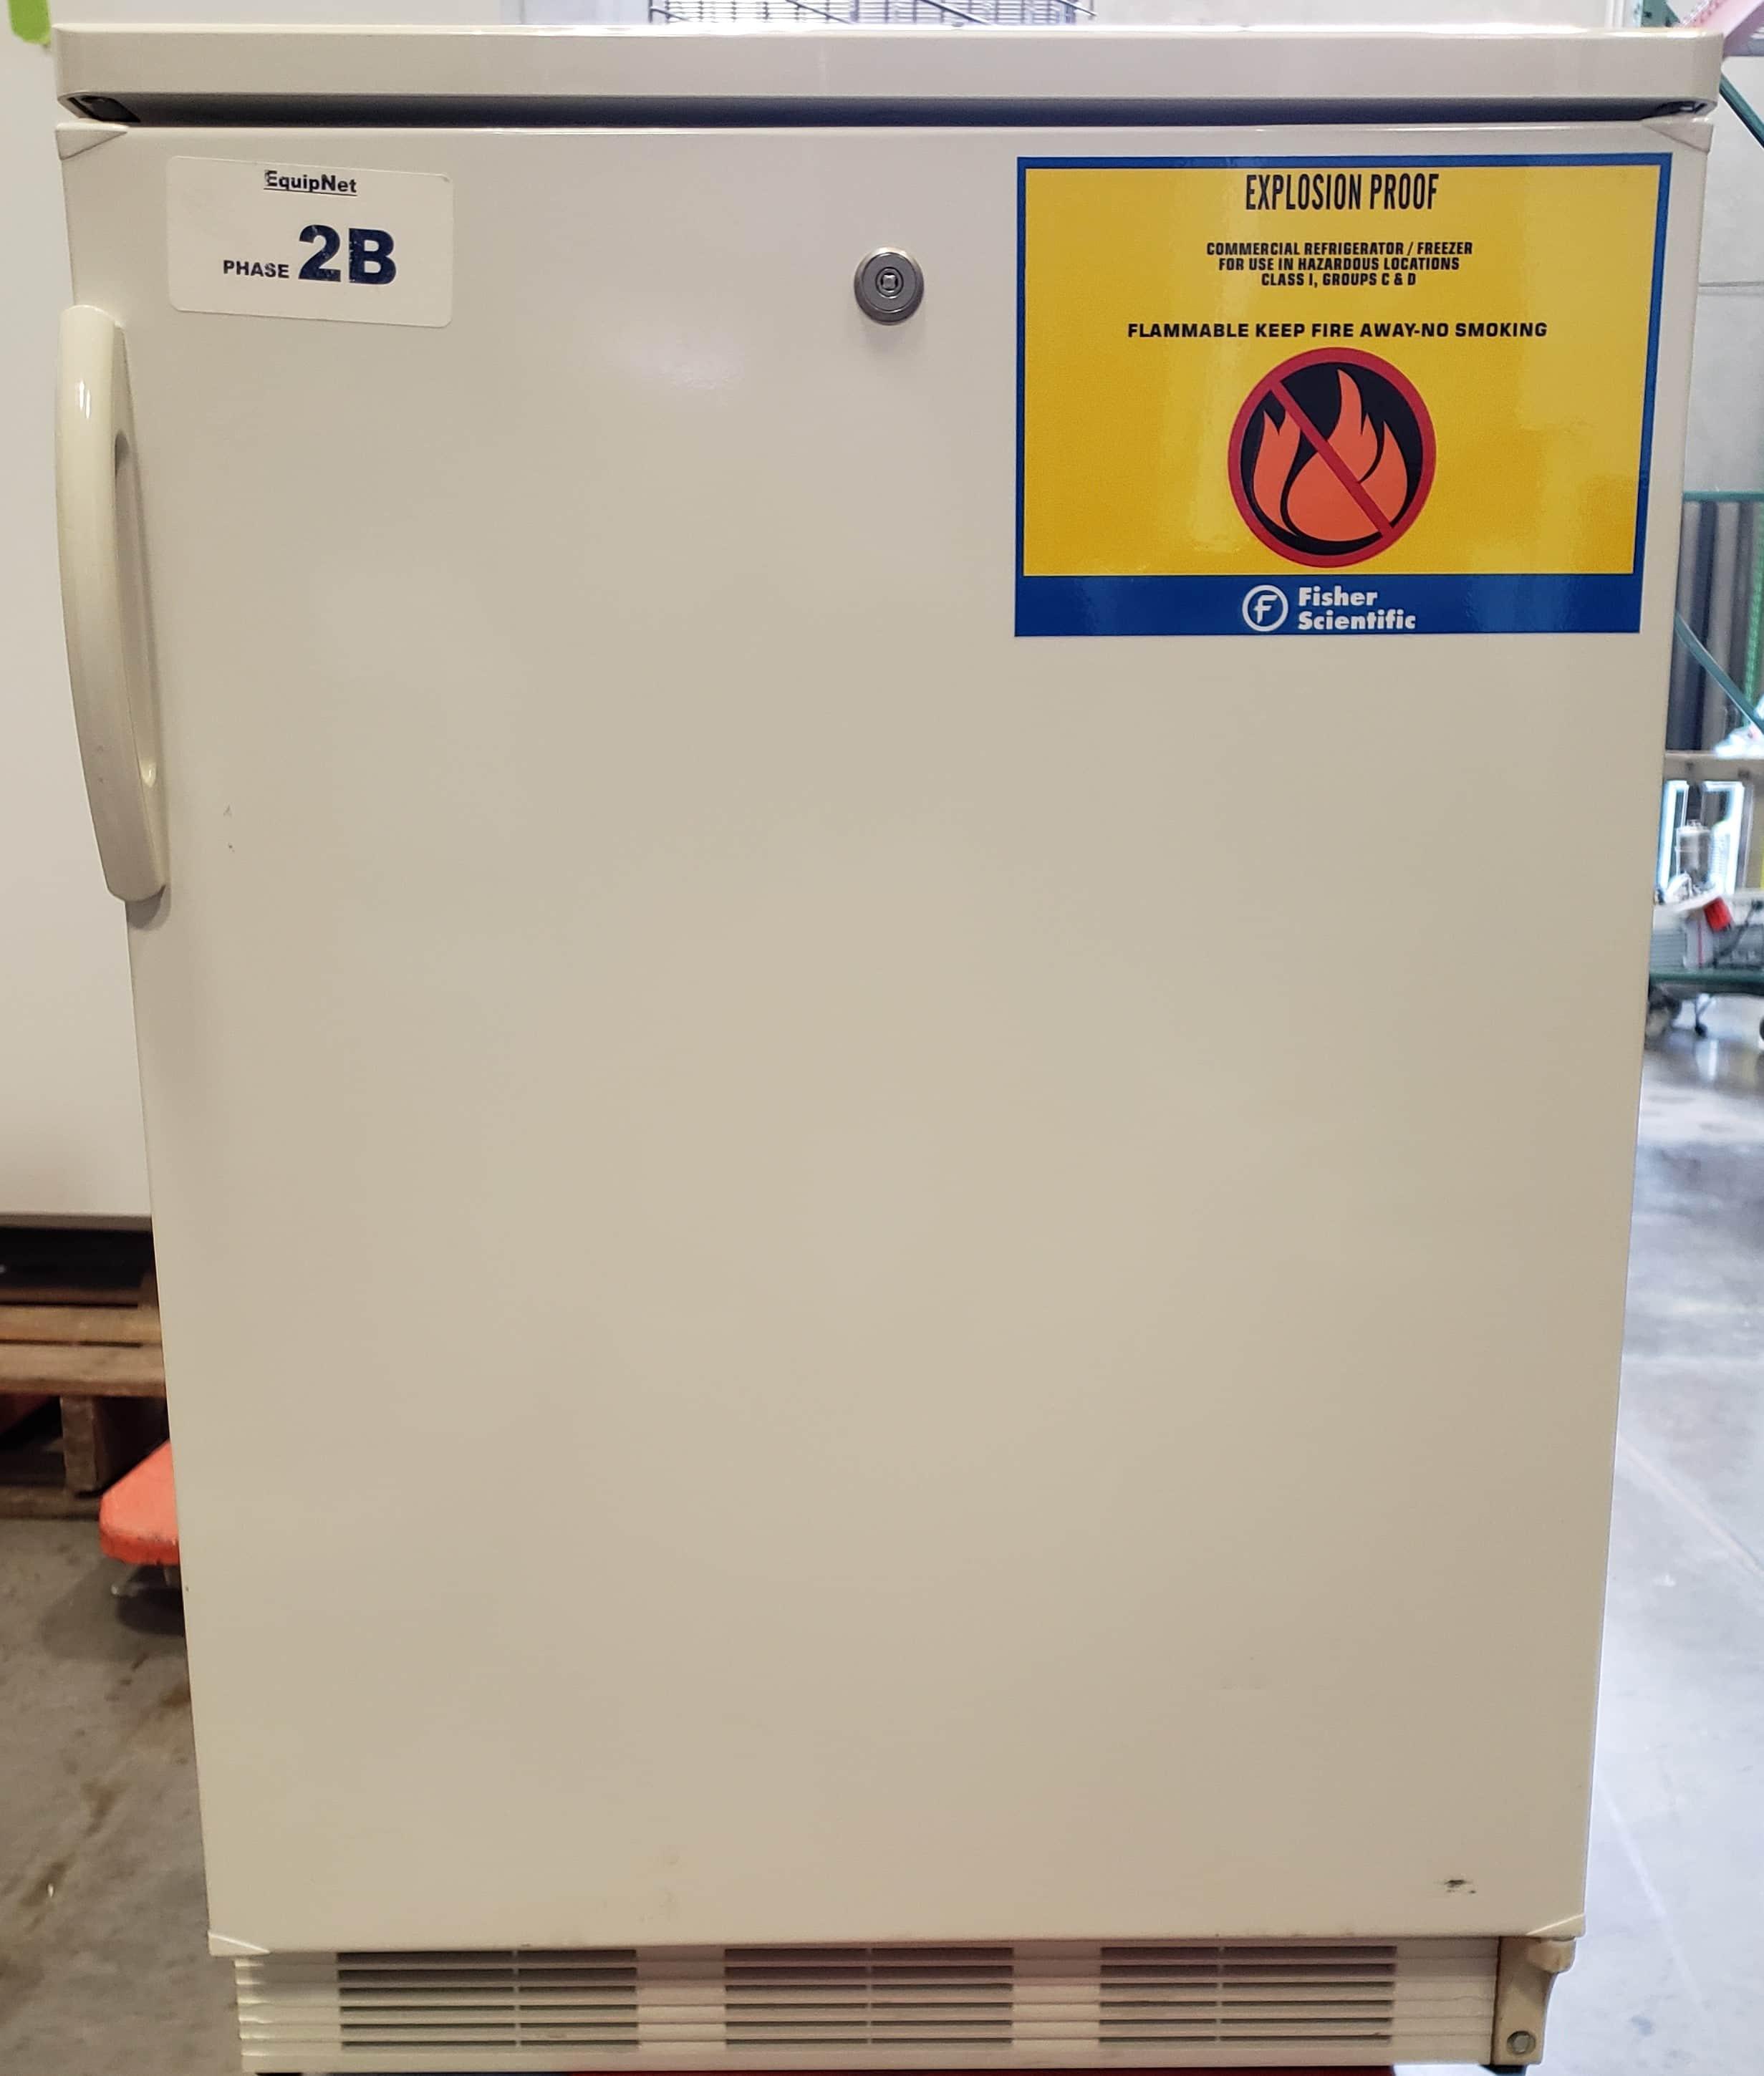 Fisher Scientific 97-950-1 Explosion-Proof Undercounter Refrigerator